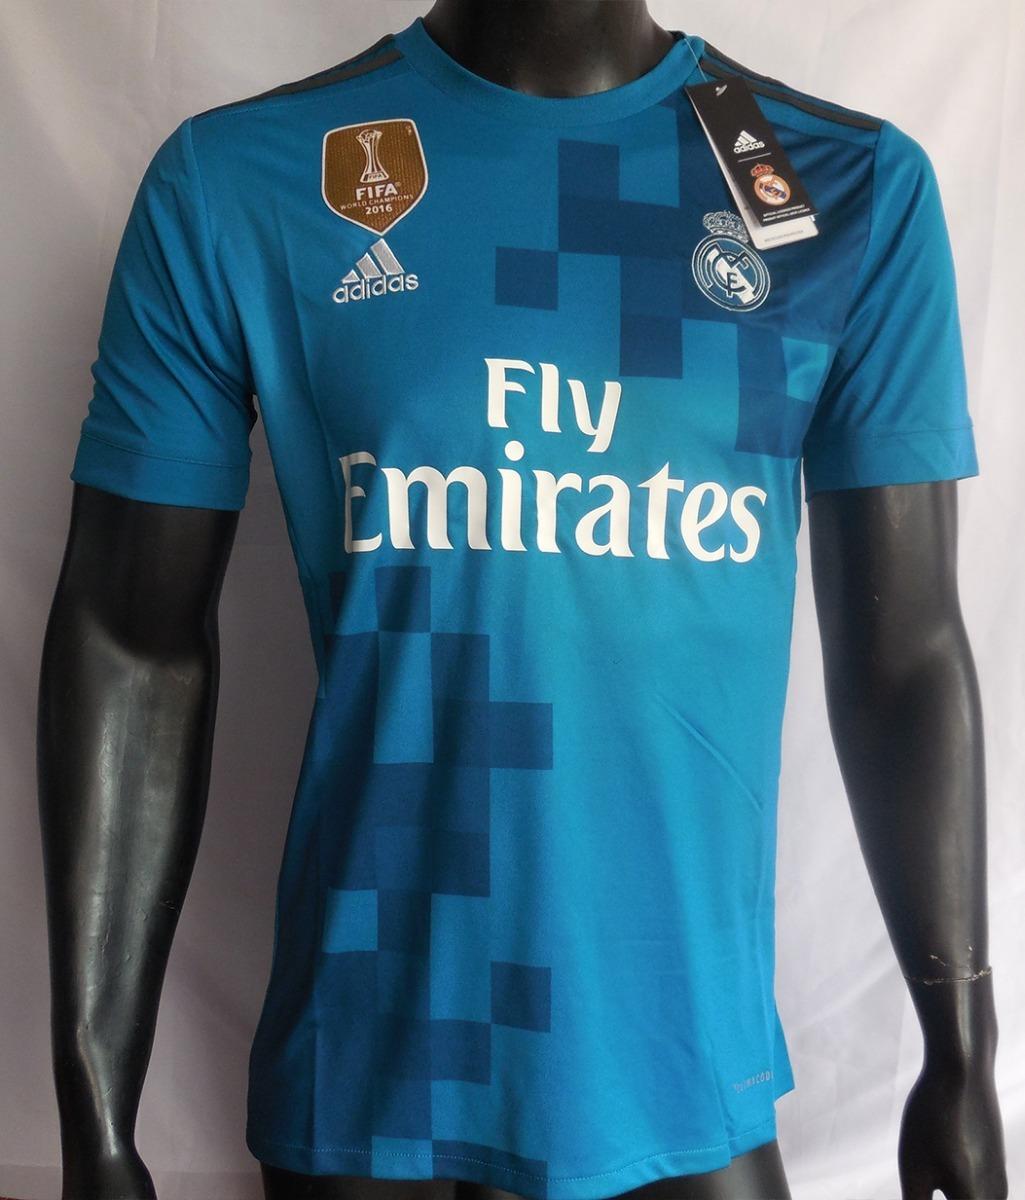 89d776d606d60 camiseta real madrid 2017 2018 tercera adidas. Cargando zoom.